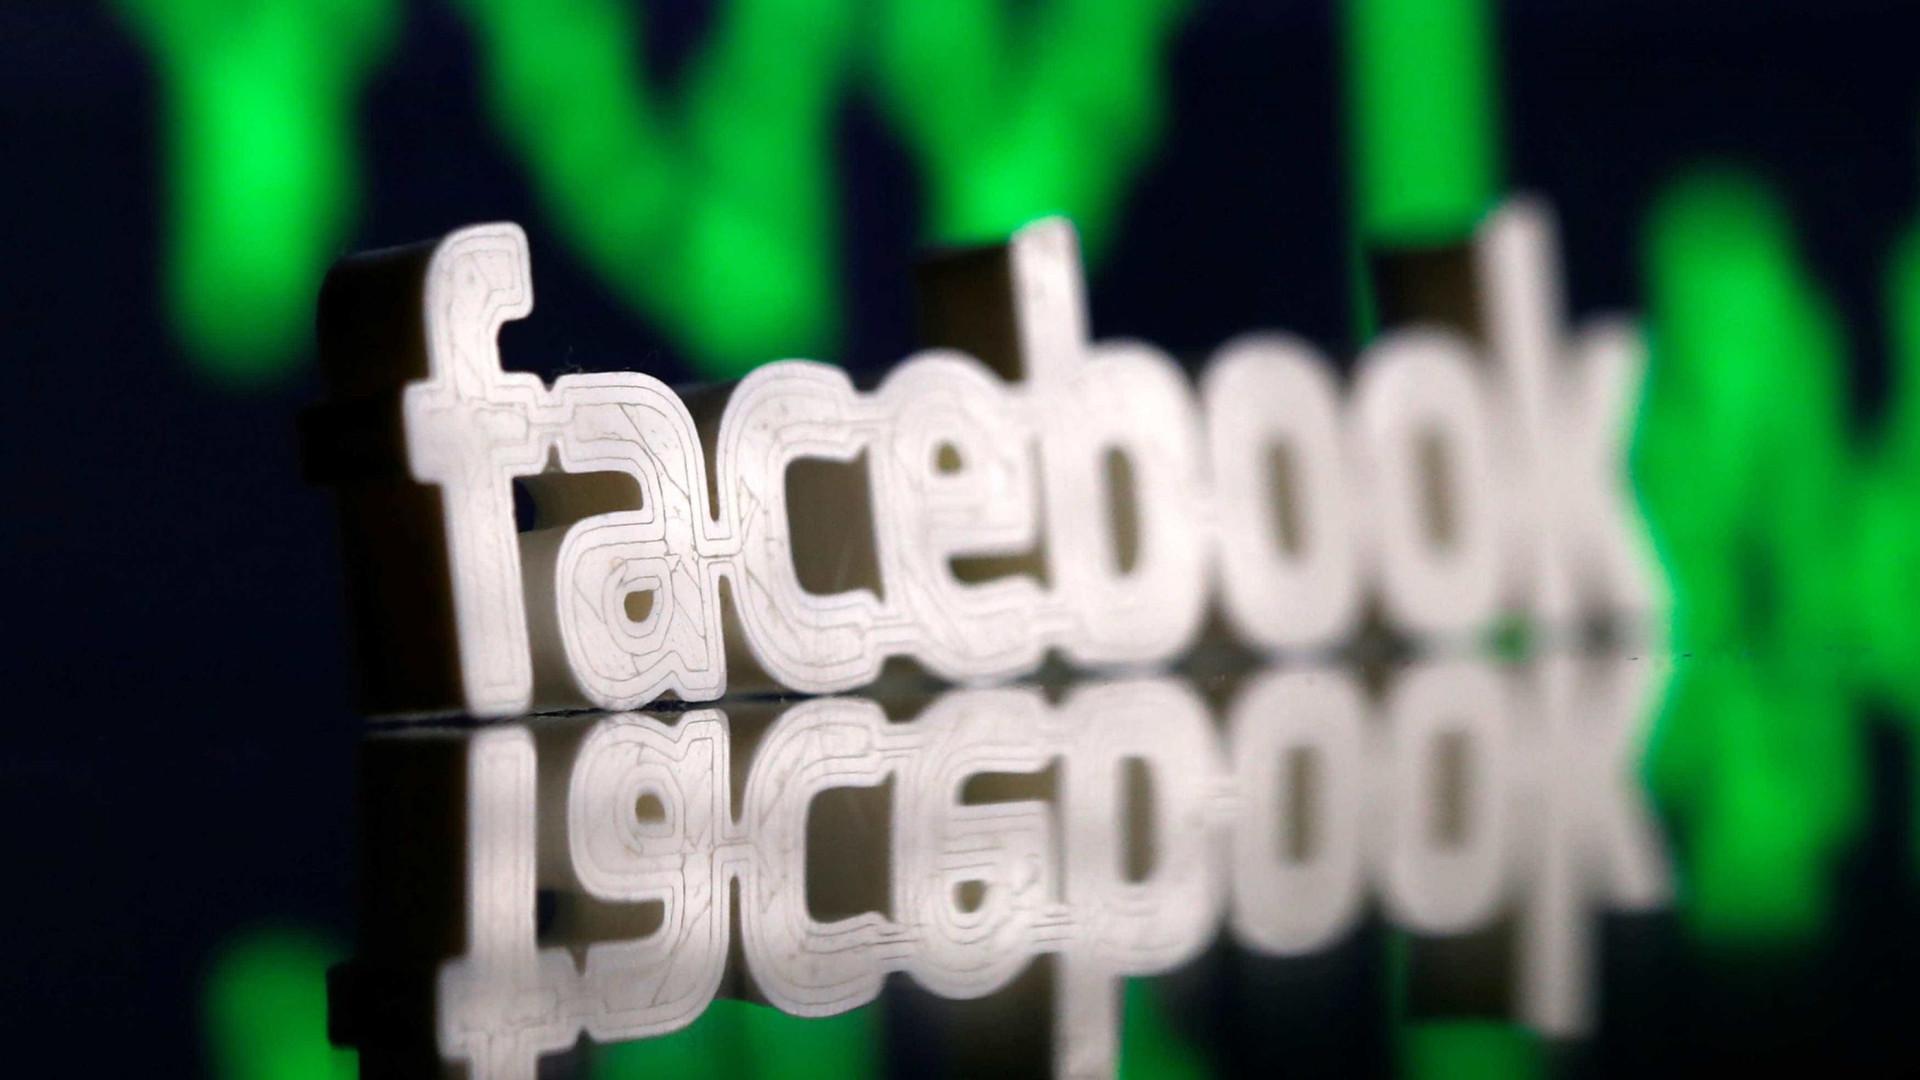 Facebook pede ajuda à Ray-Ban para desenvolver óculos inteligentes